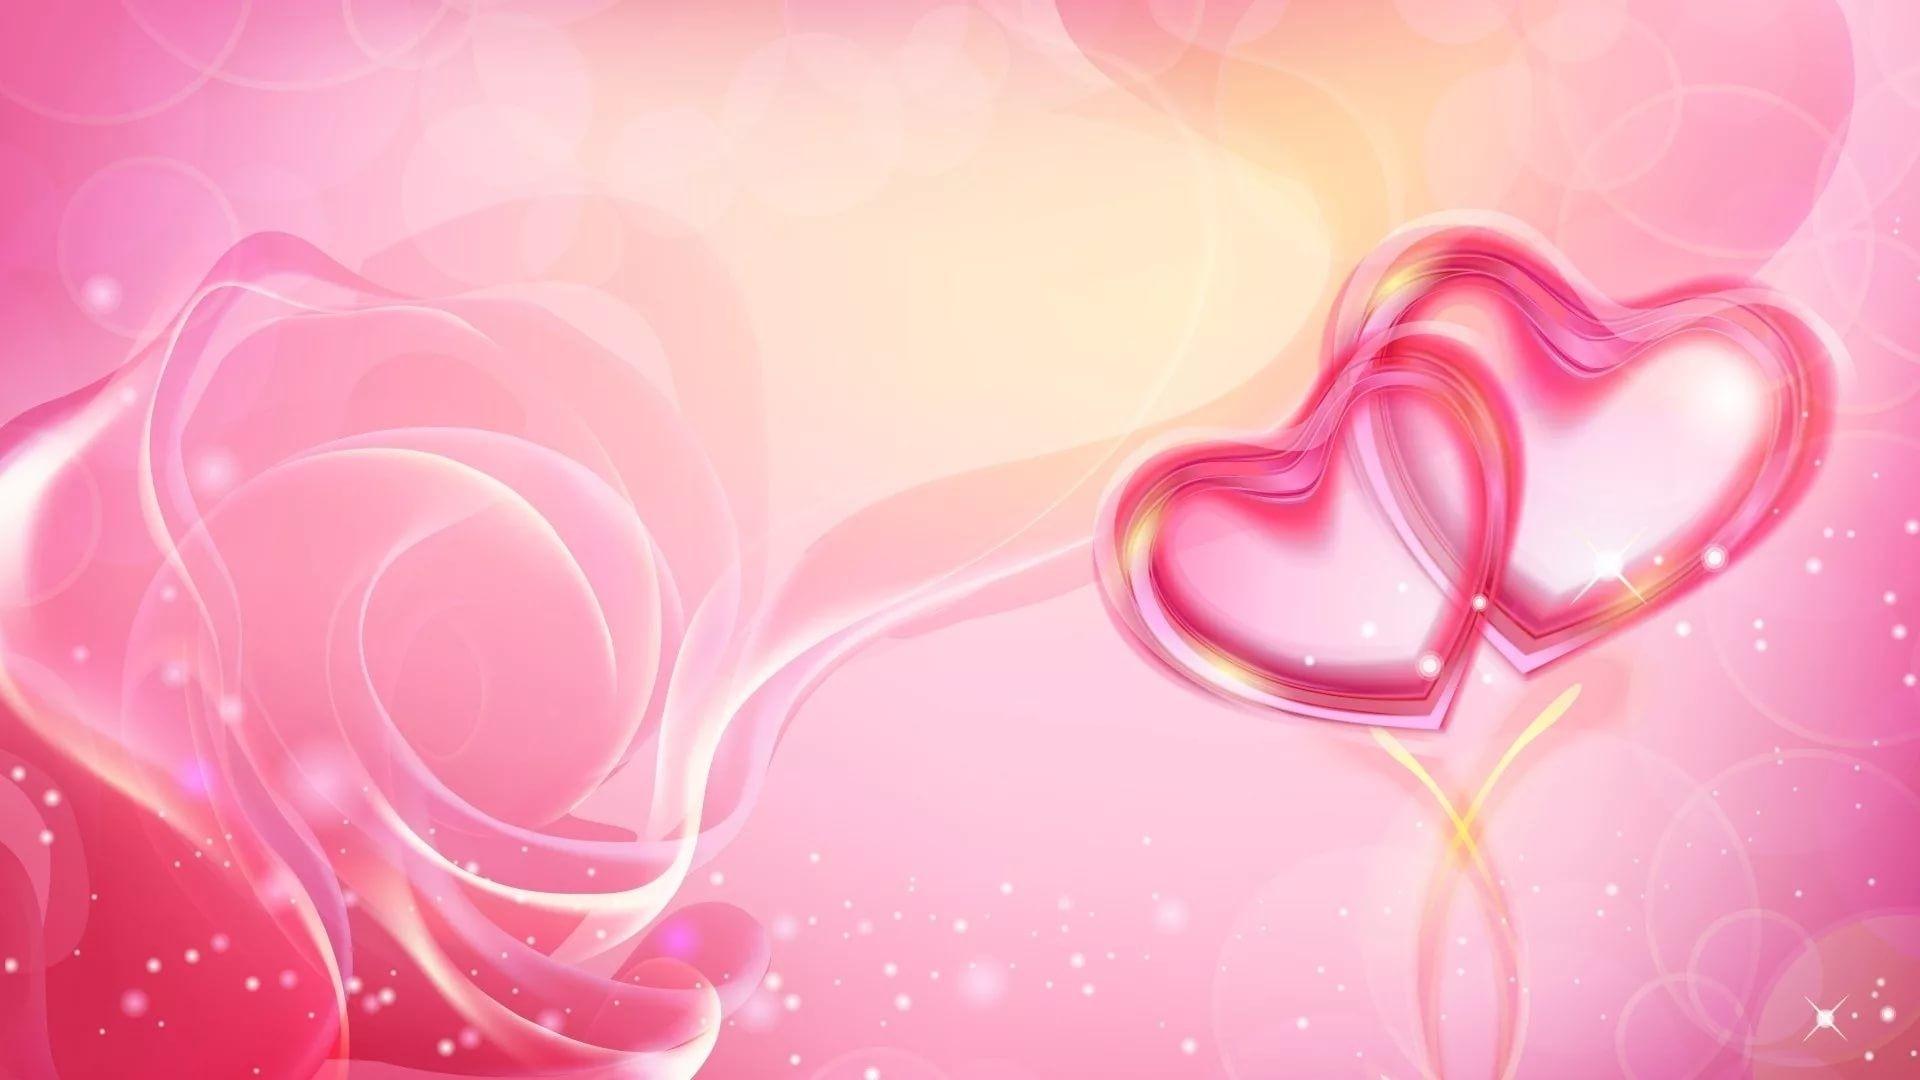 Pink Heart Download Wallpaper